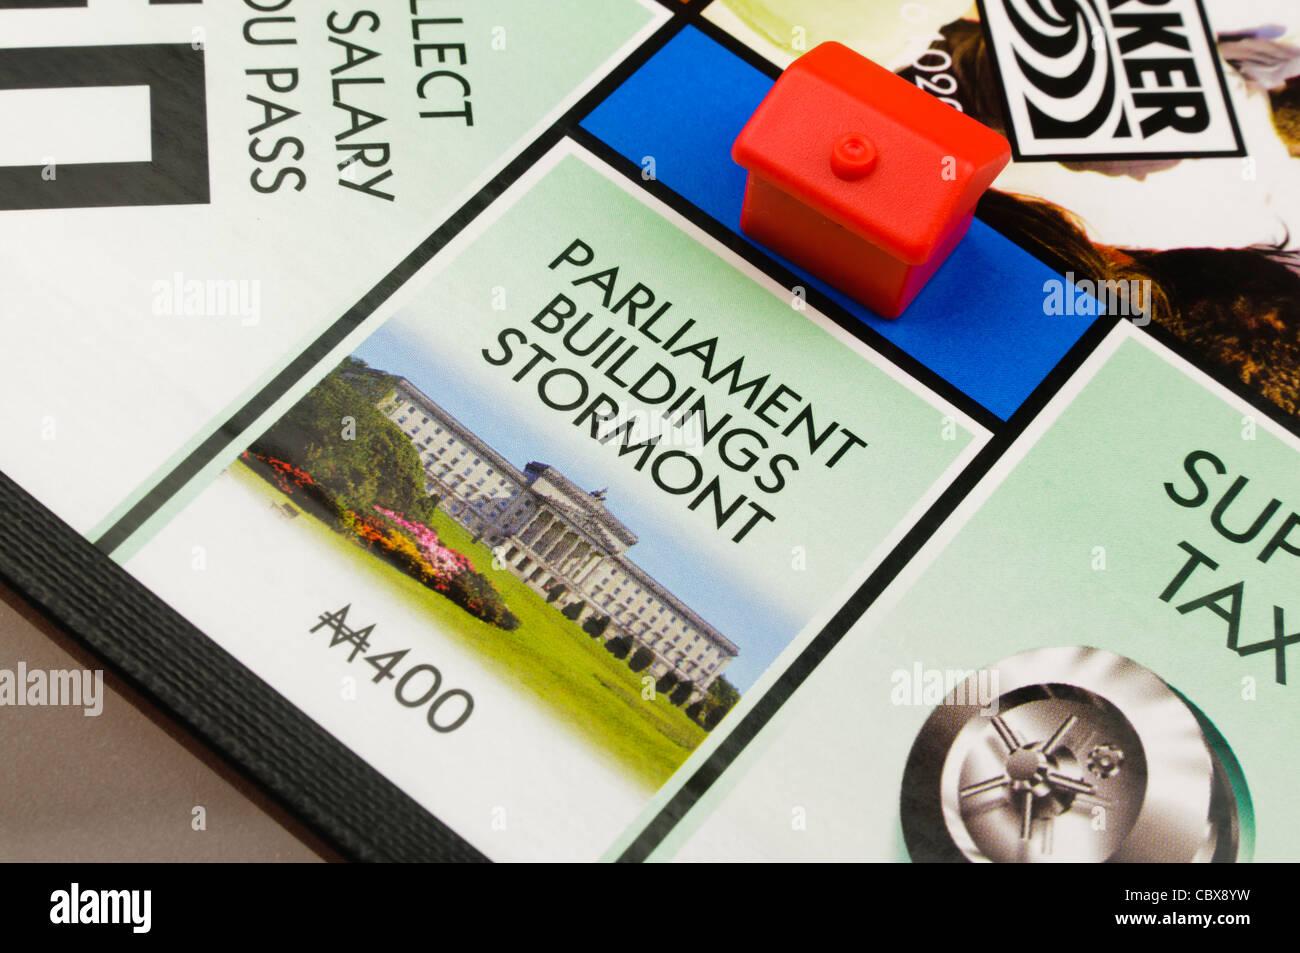 Belfast-Monopol: Bau eines Hotels am Parlamentsgebäude Stockbild